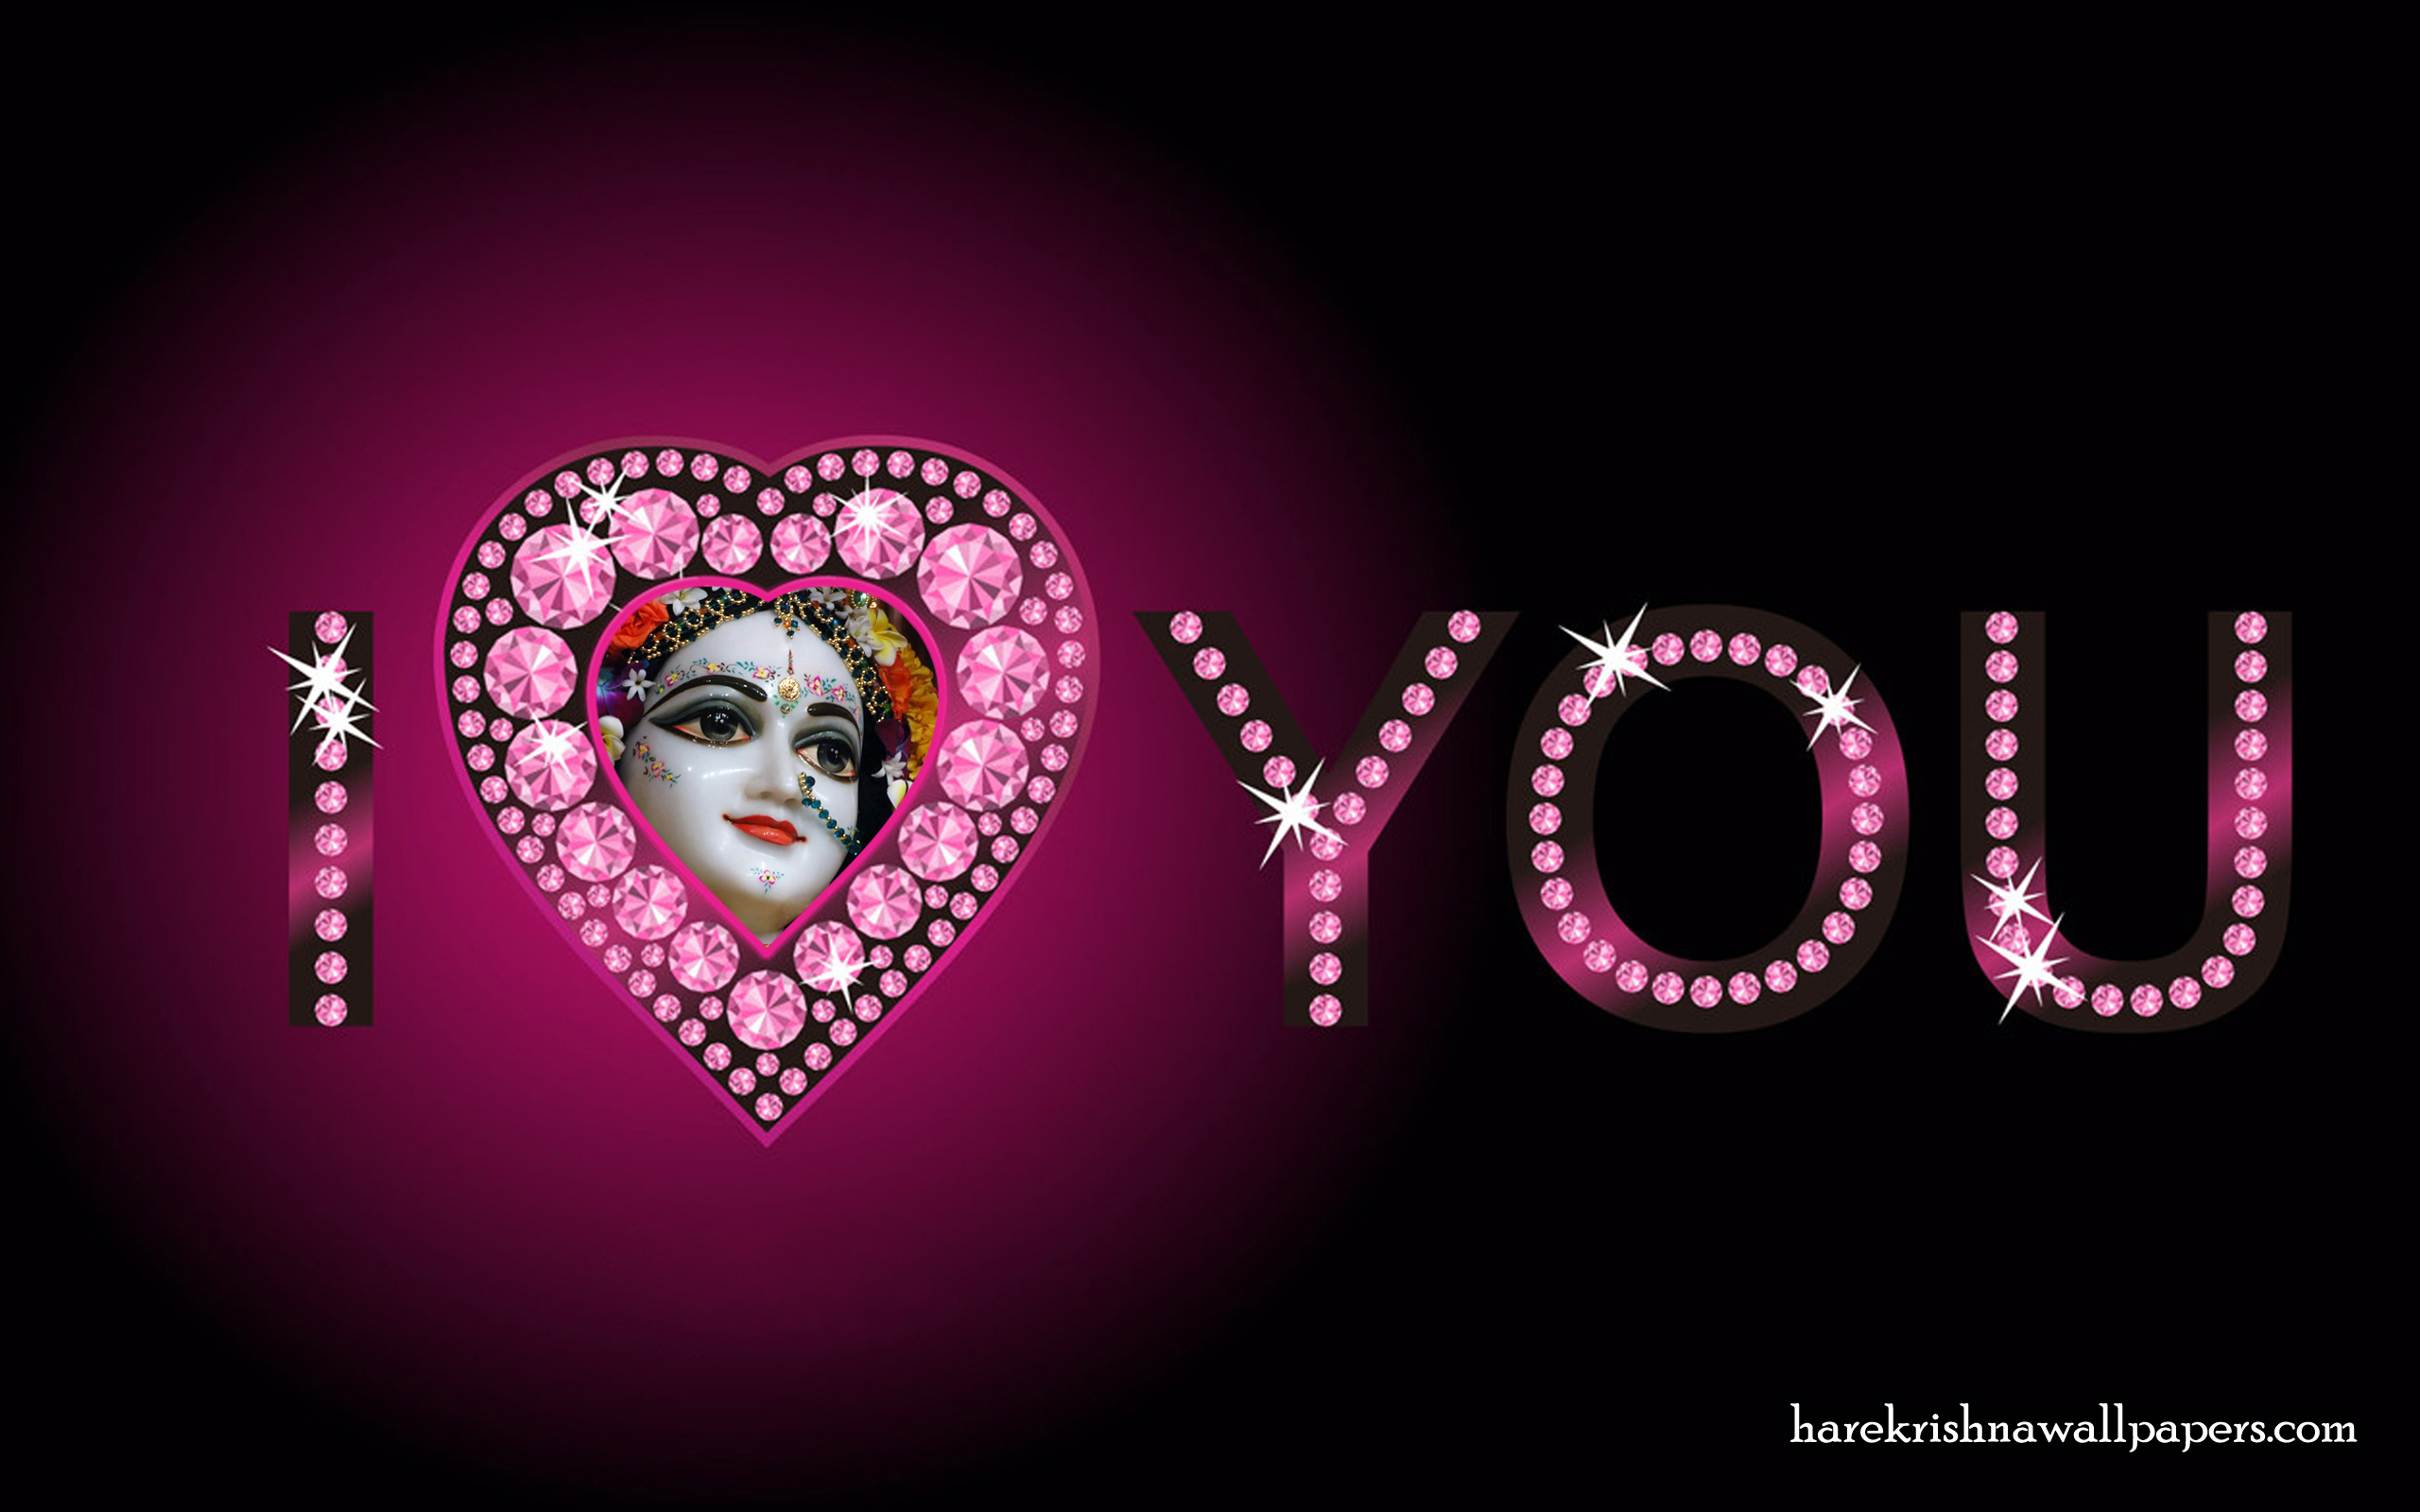 I Love You Radharani Wallpaper (013) Size 2560x1600 Download